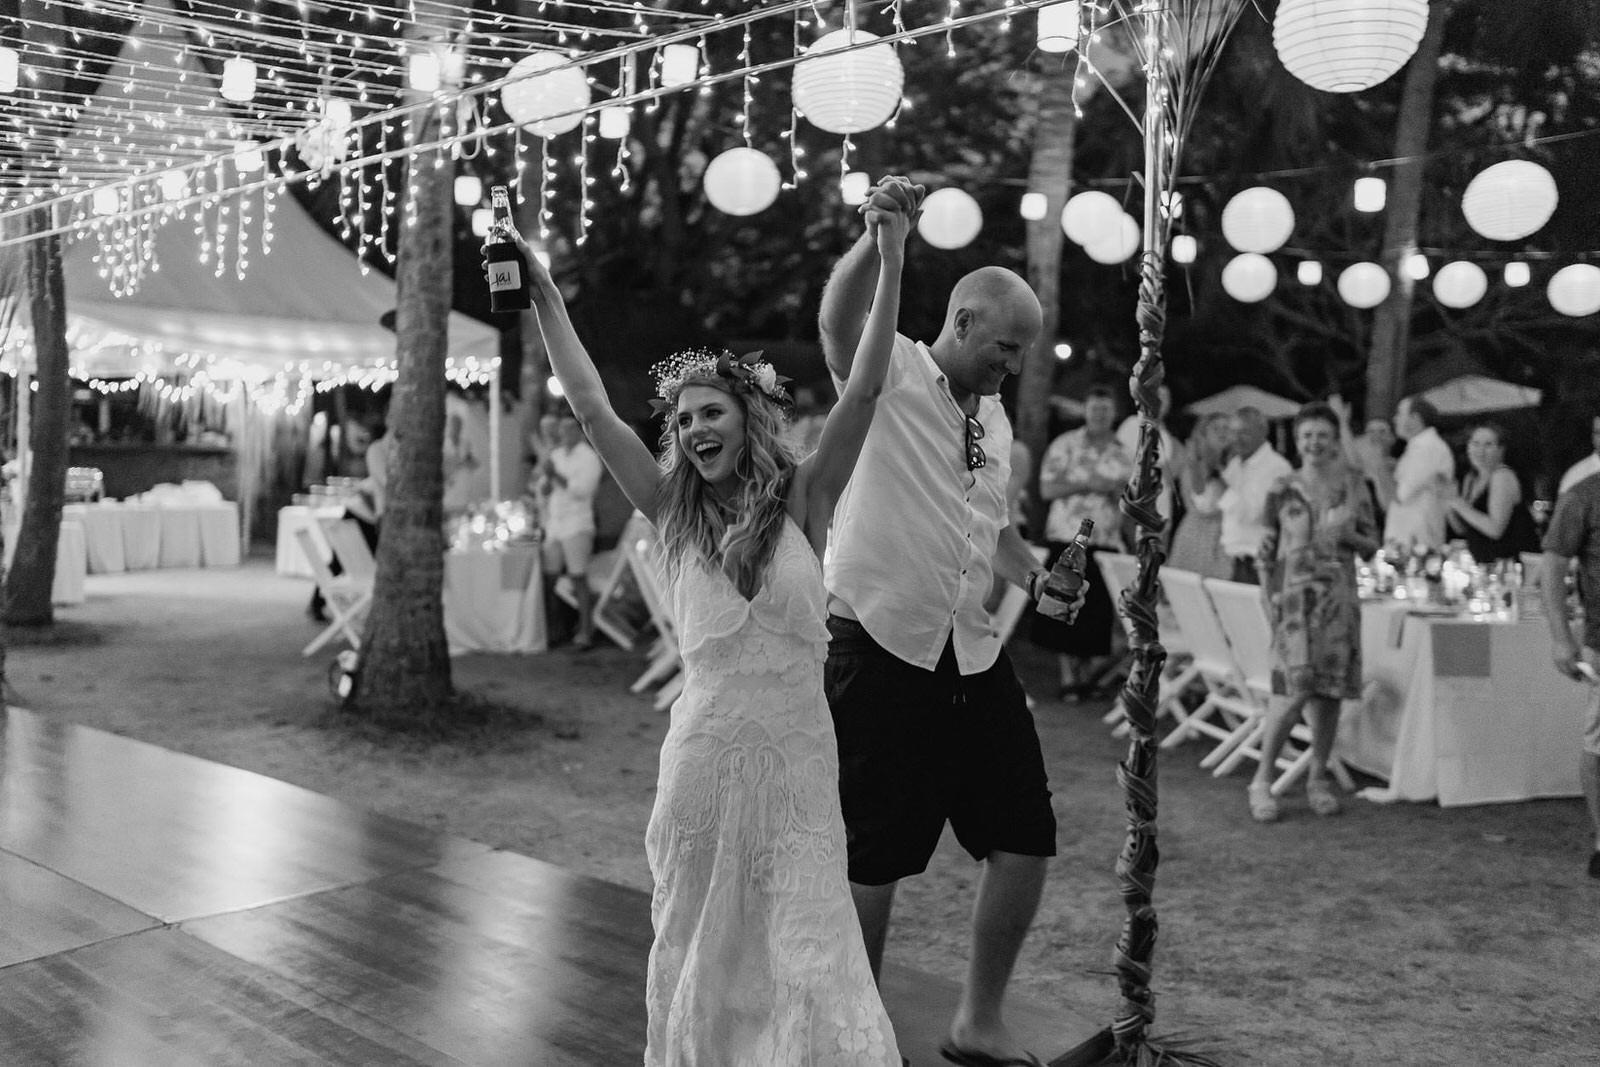 newfound-hai-tide-nusa-lembongan-bali-wedding-photographers-145